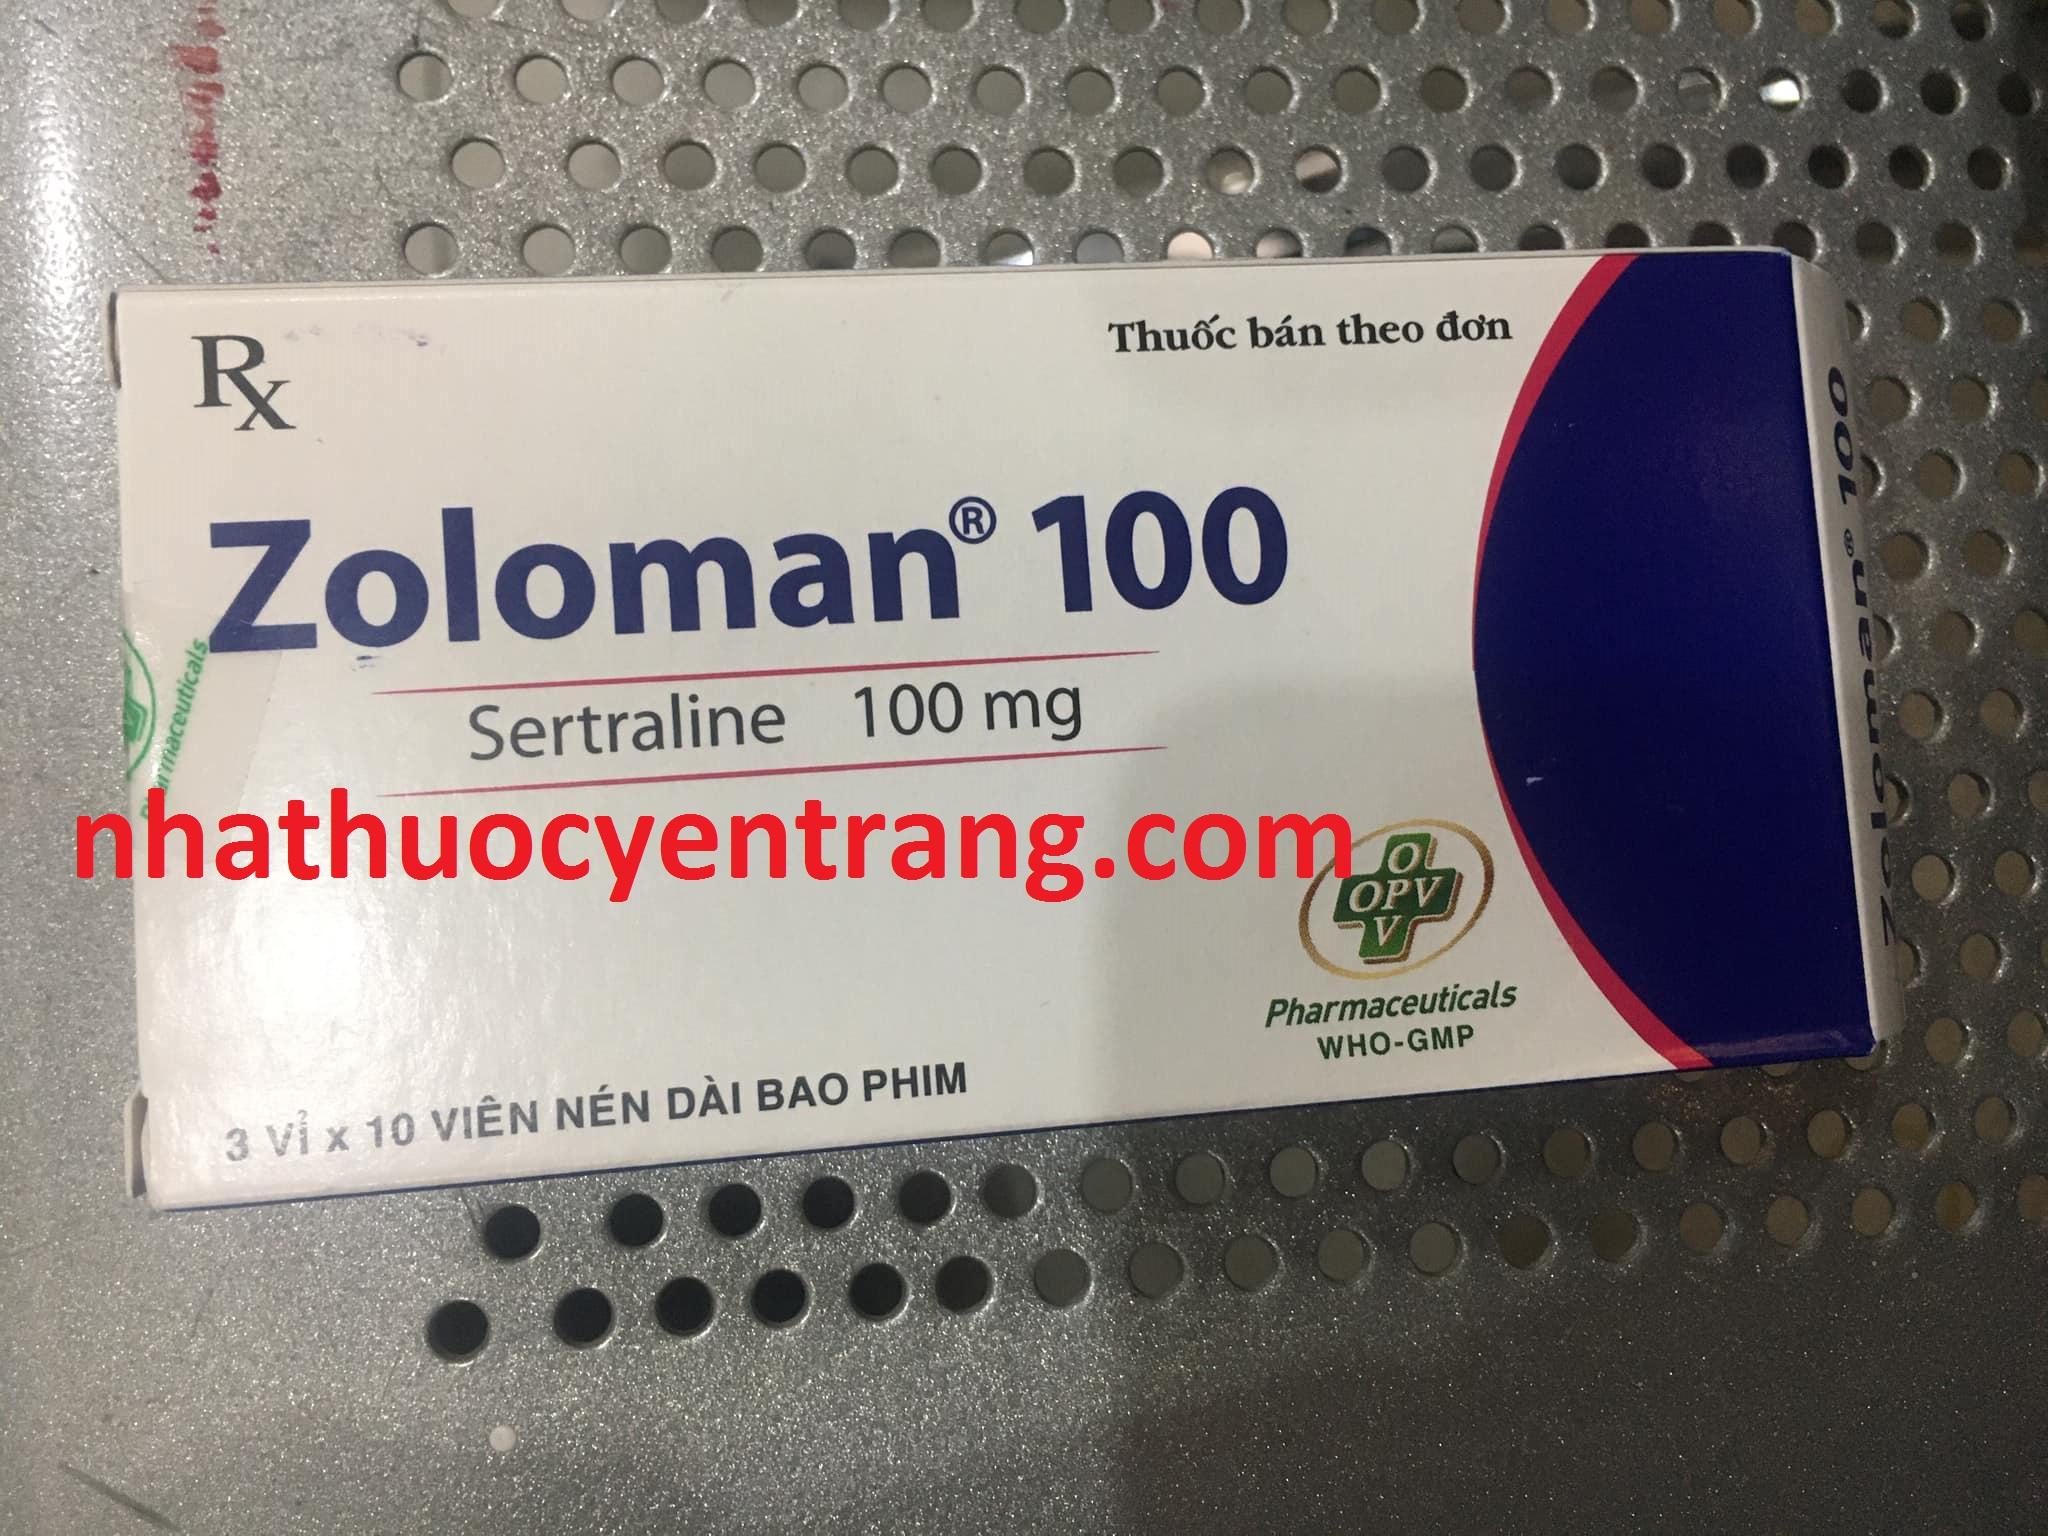 Zoloman 100mg